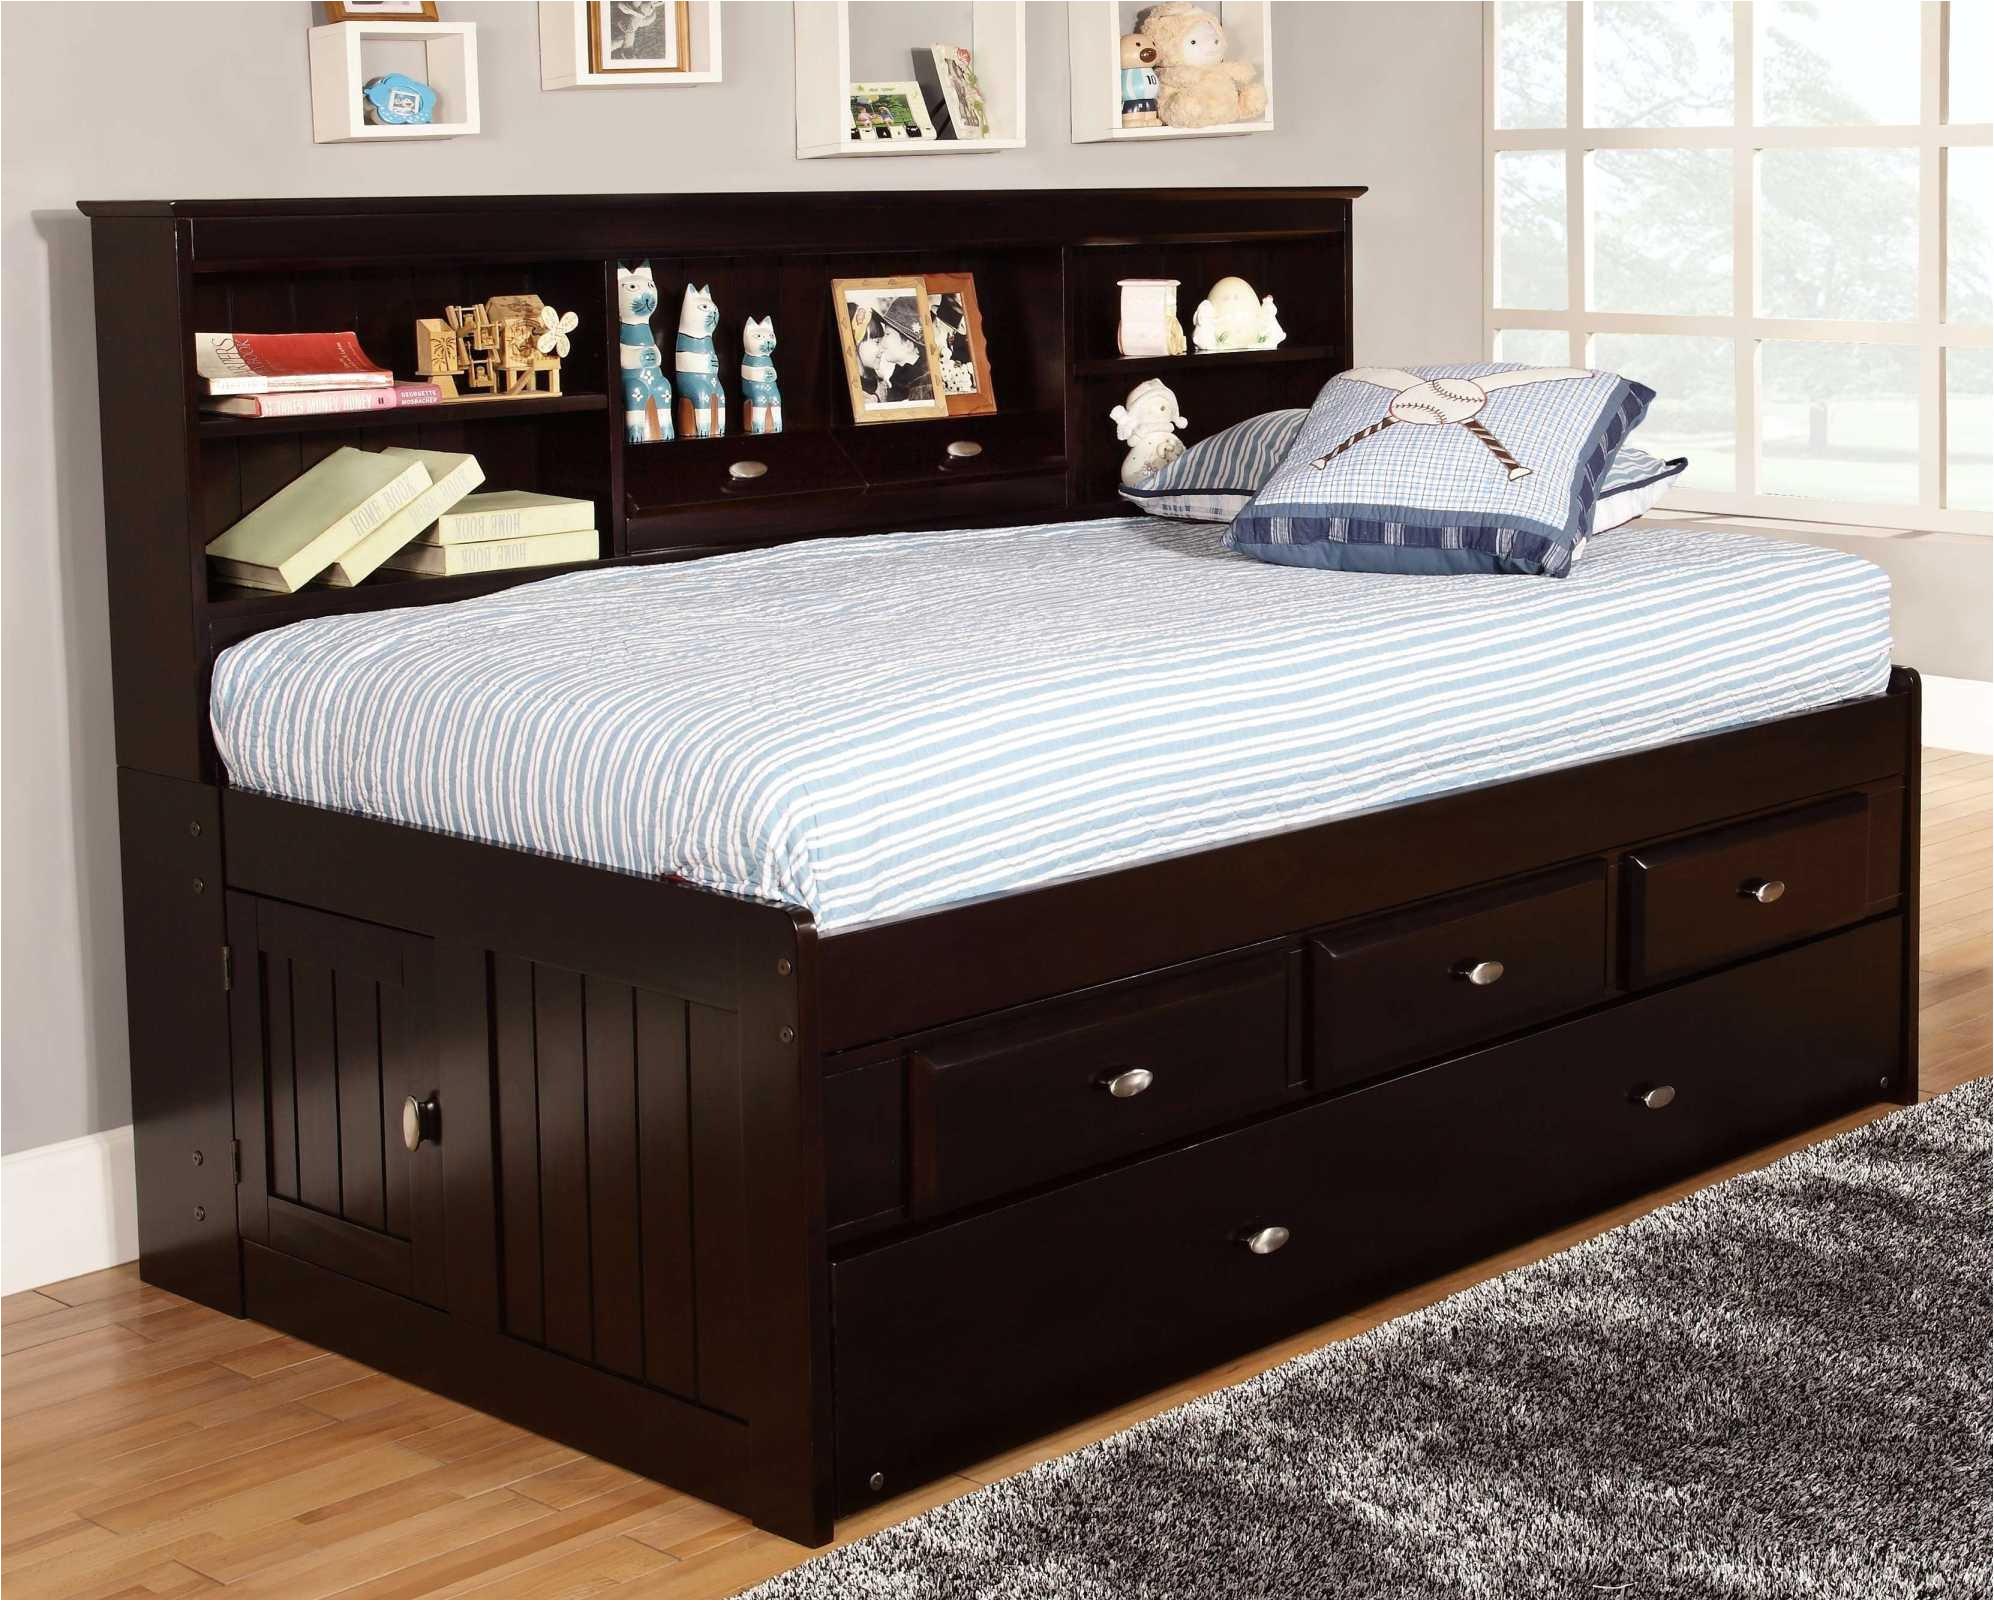 klapbed ikea nieuw ikea sofa bed wooden slats best ikea black bed frame luxury ikea fotografie